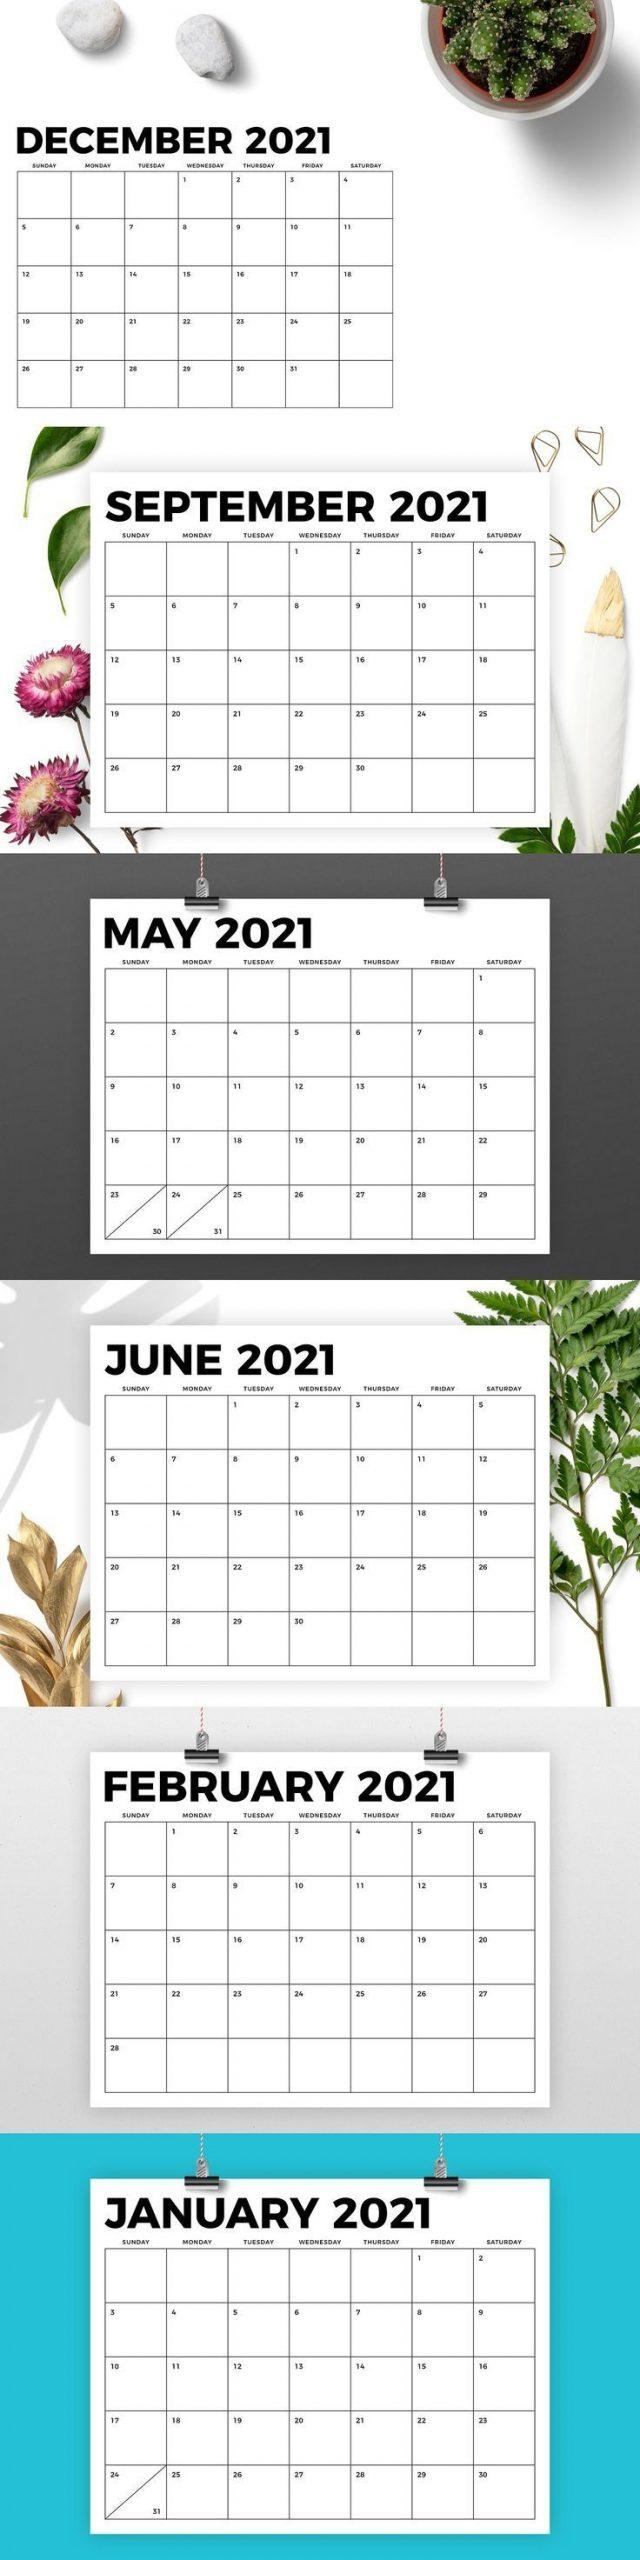 8 5 X 11 Inch Bold 2021 Calendar In 2020 | Calendar